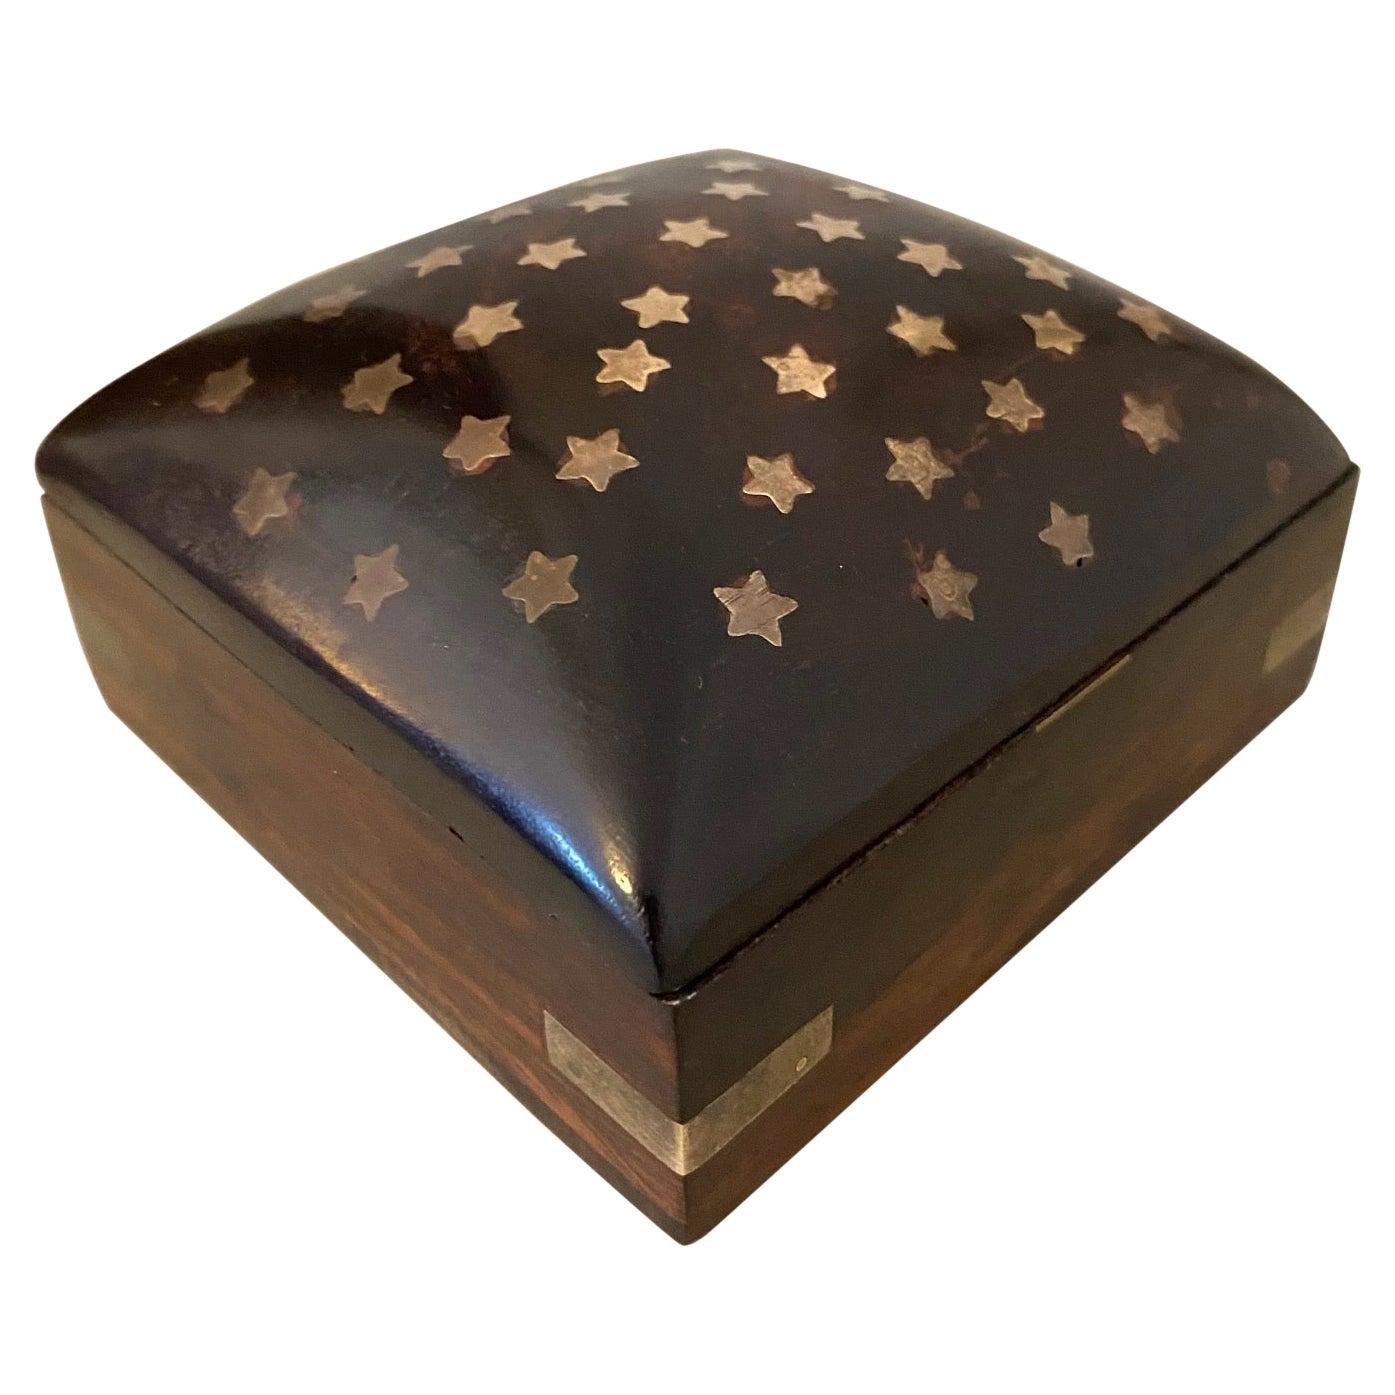 Vintage Trinket Rosewood Box with Brass Star Inlays, Denmark, c. 1960's